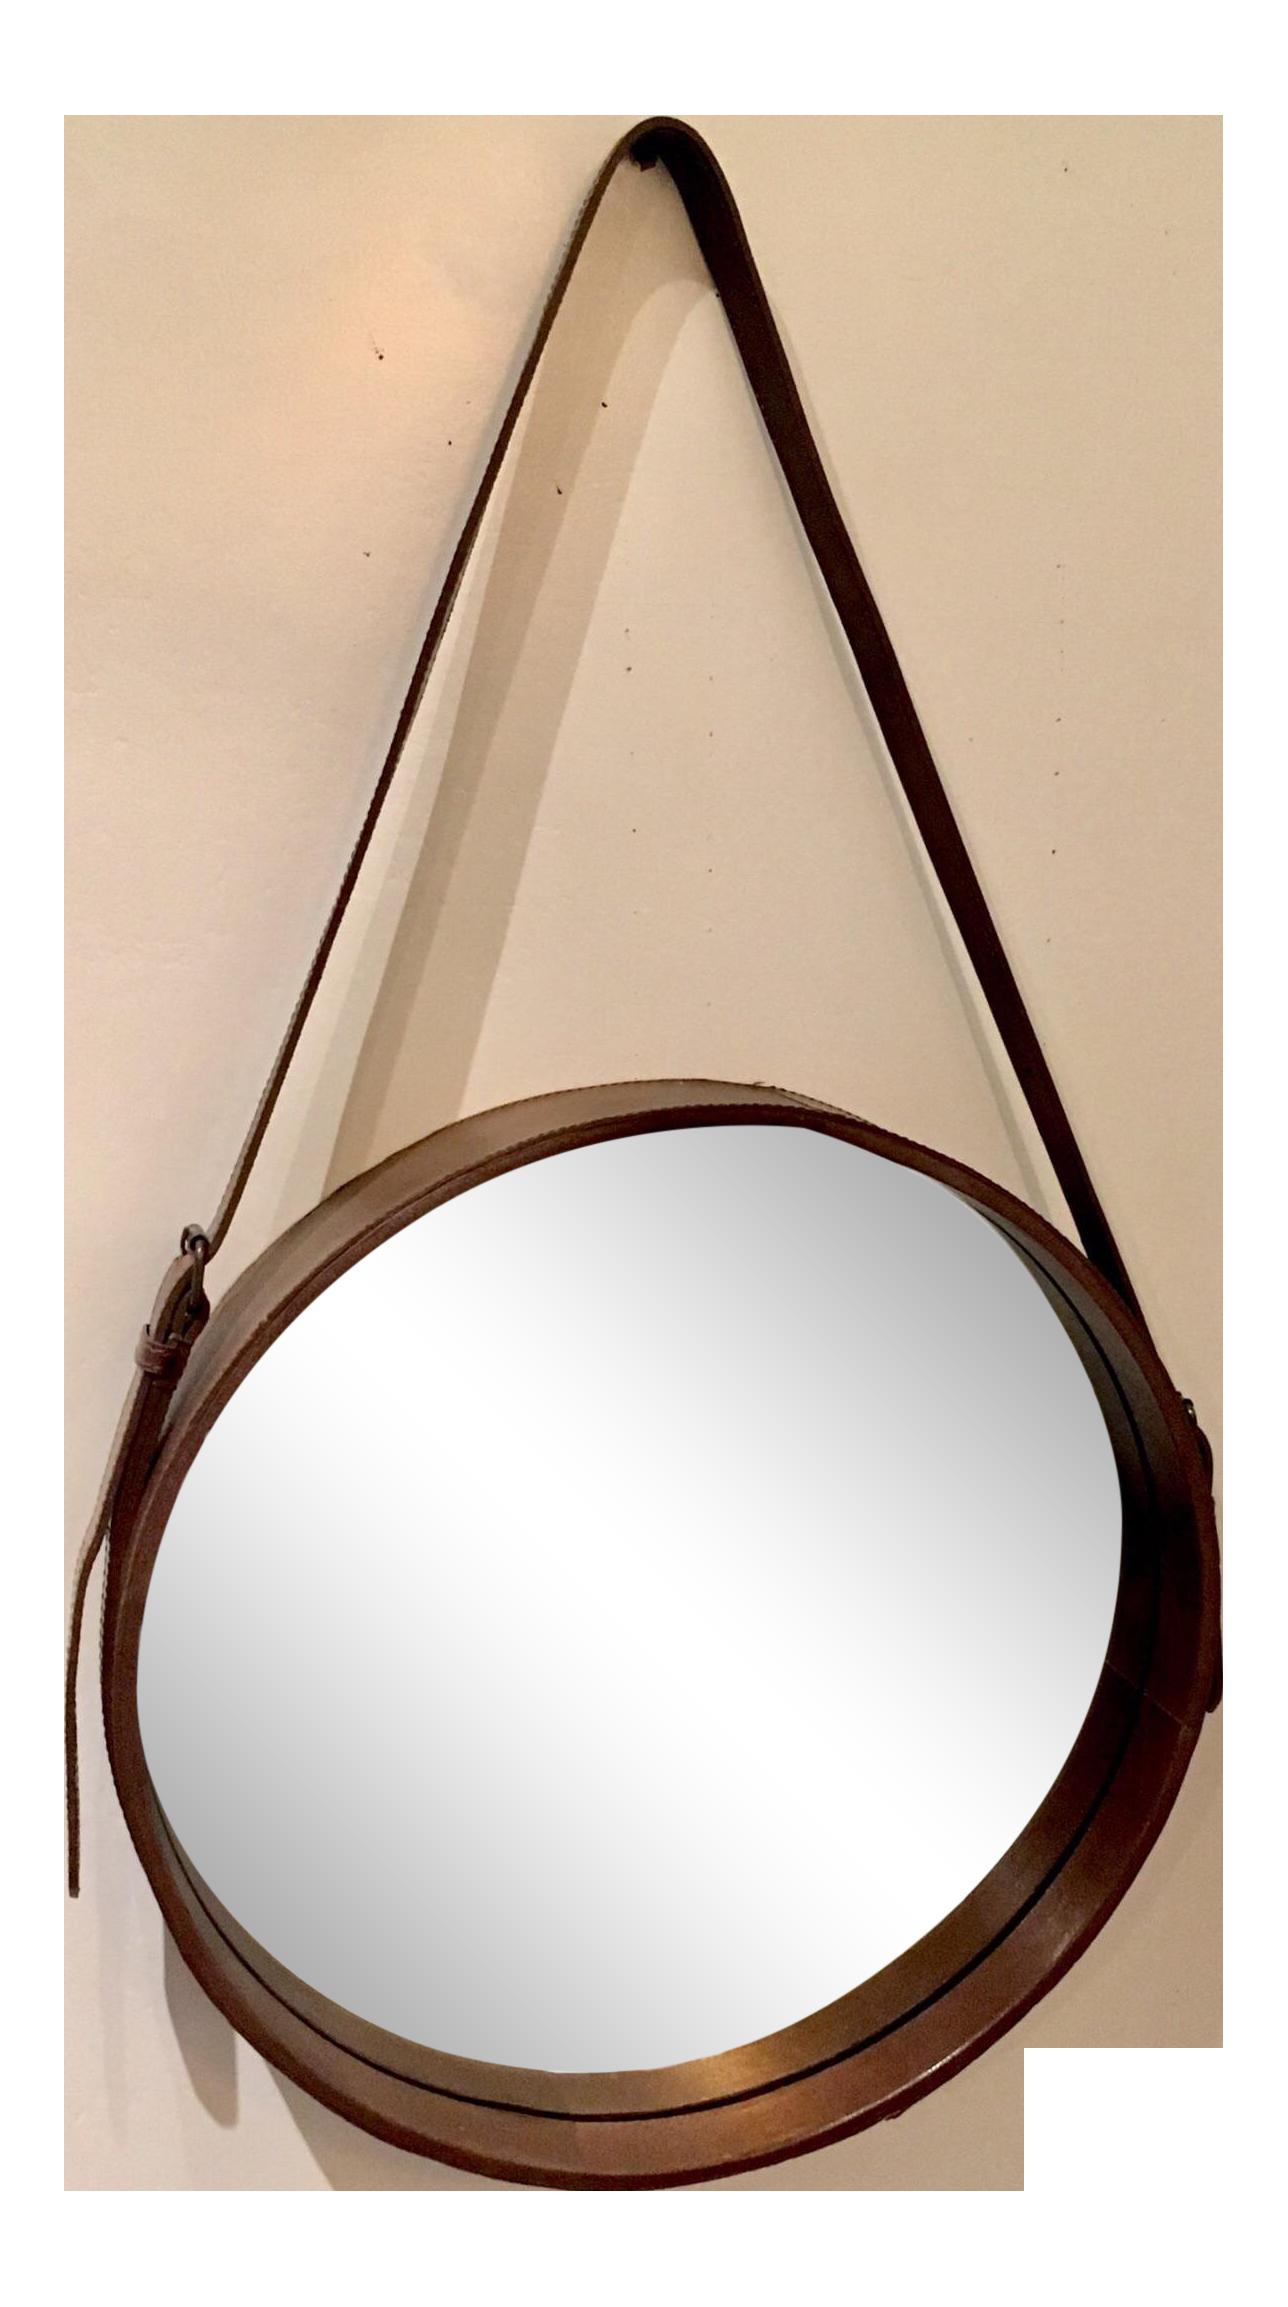 Lawson Fenning Leather Strap Mirror Chairish